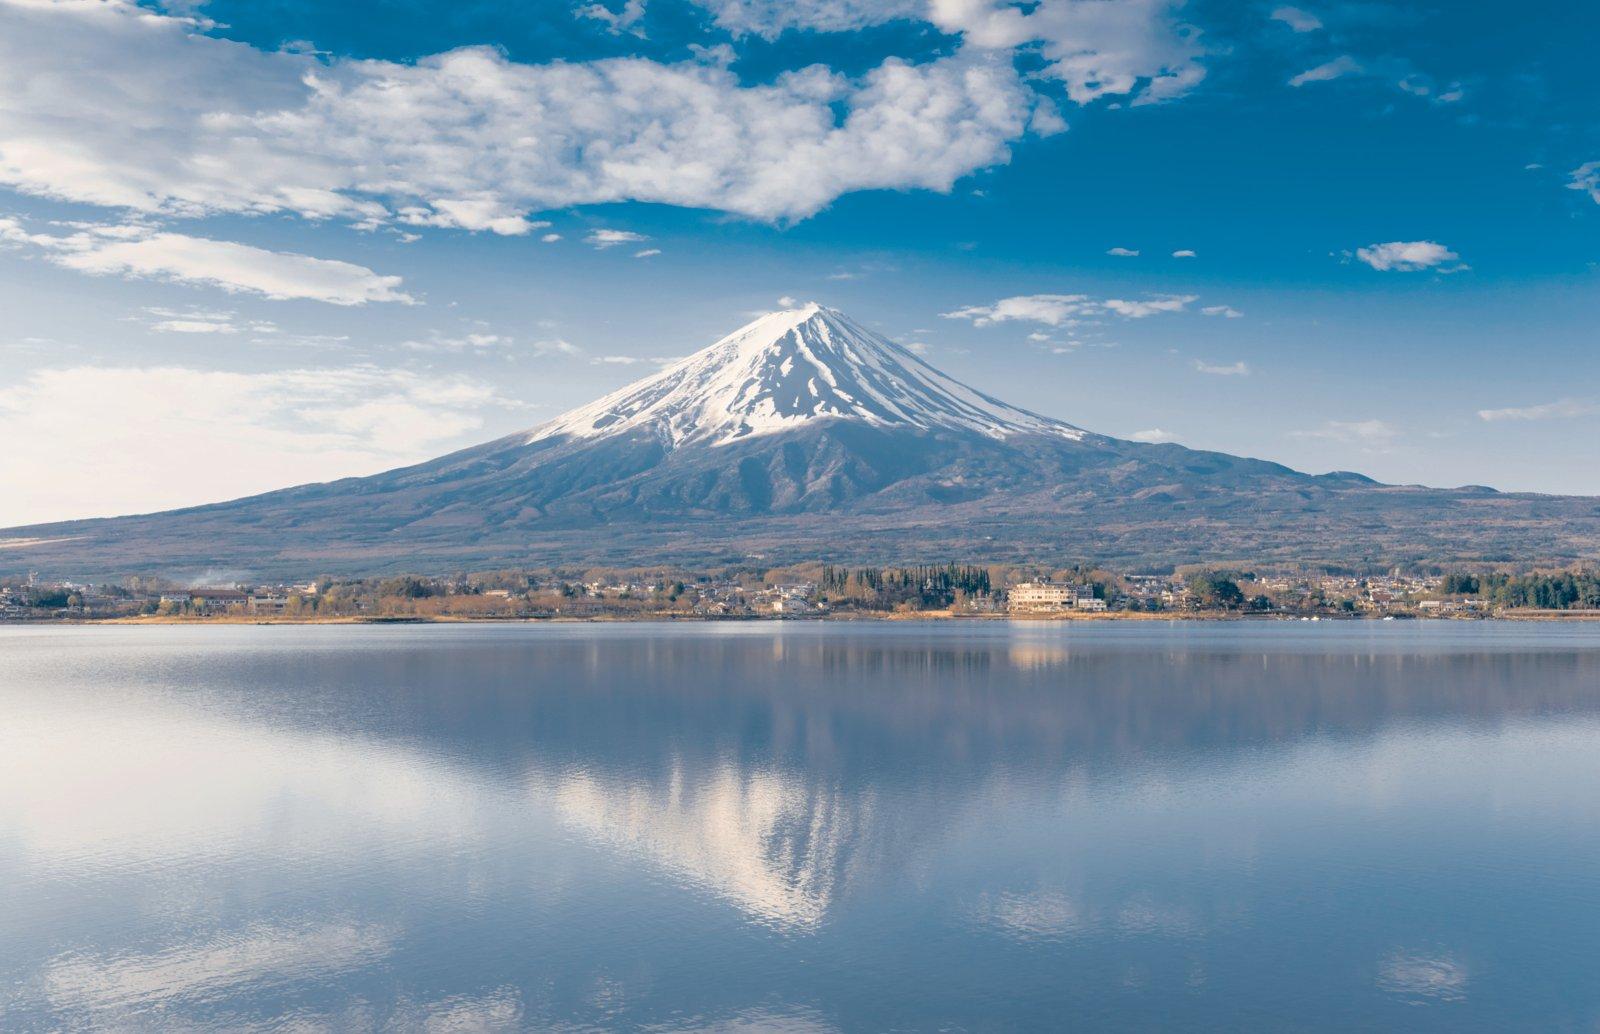 Climb Japan's iconic Mount Fuji | Evaneos